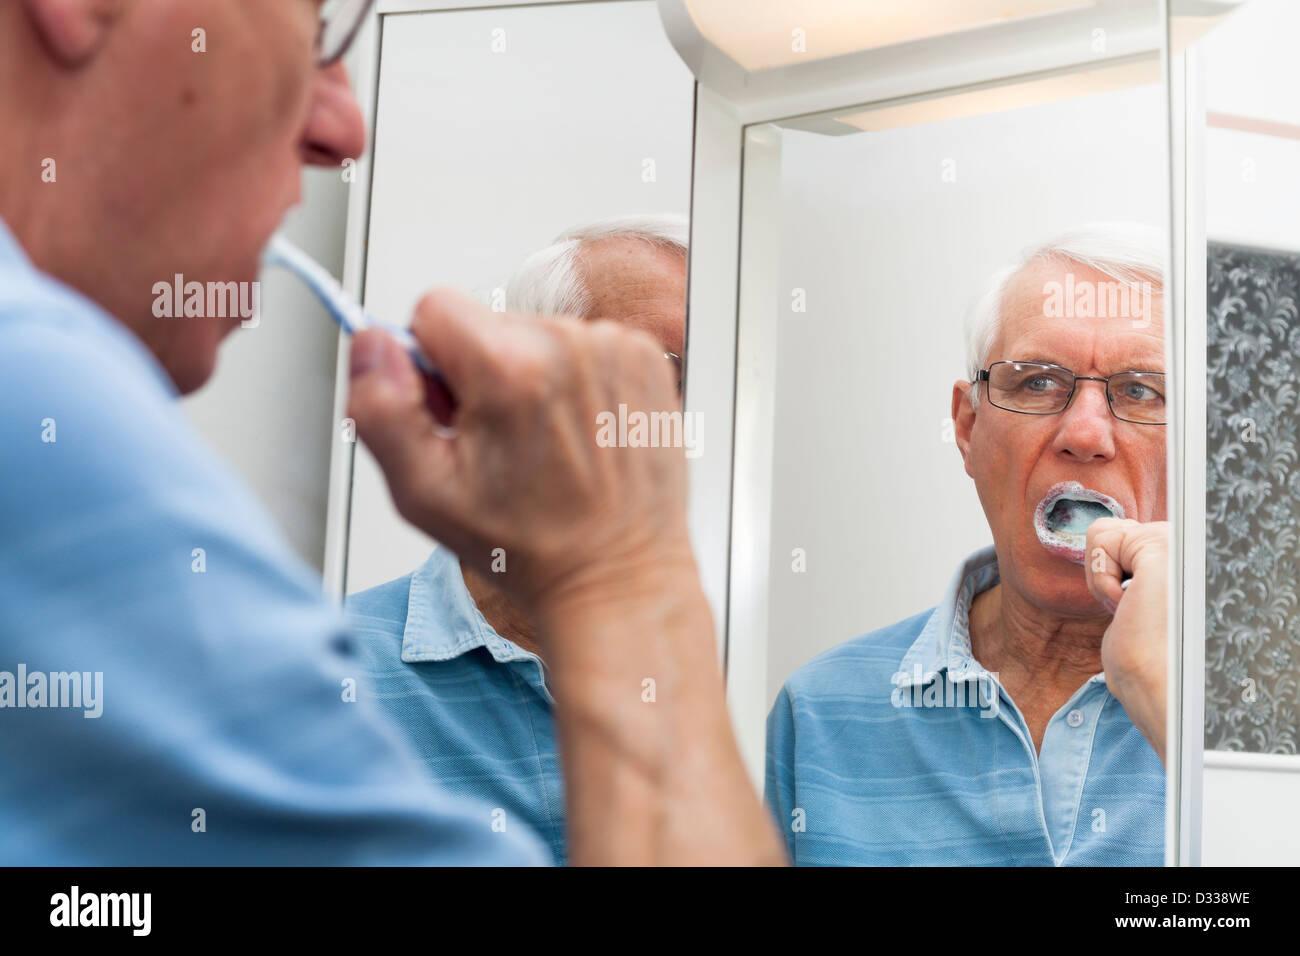 Close up of senior man reflected in mirror brushing his teeth. - Stock Image